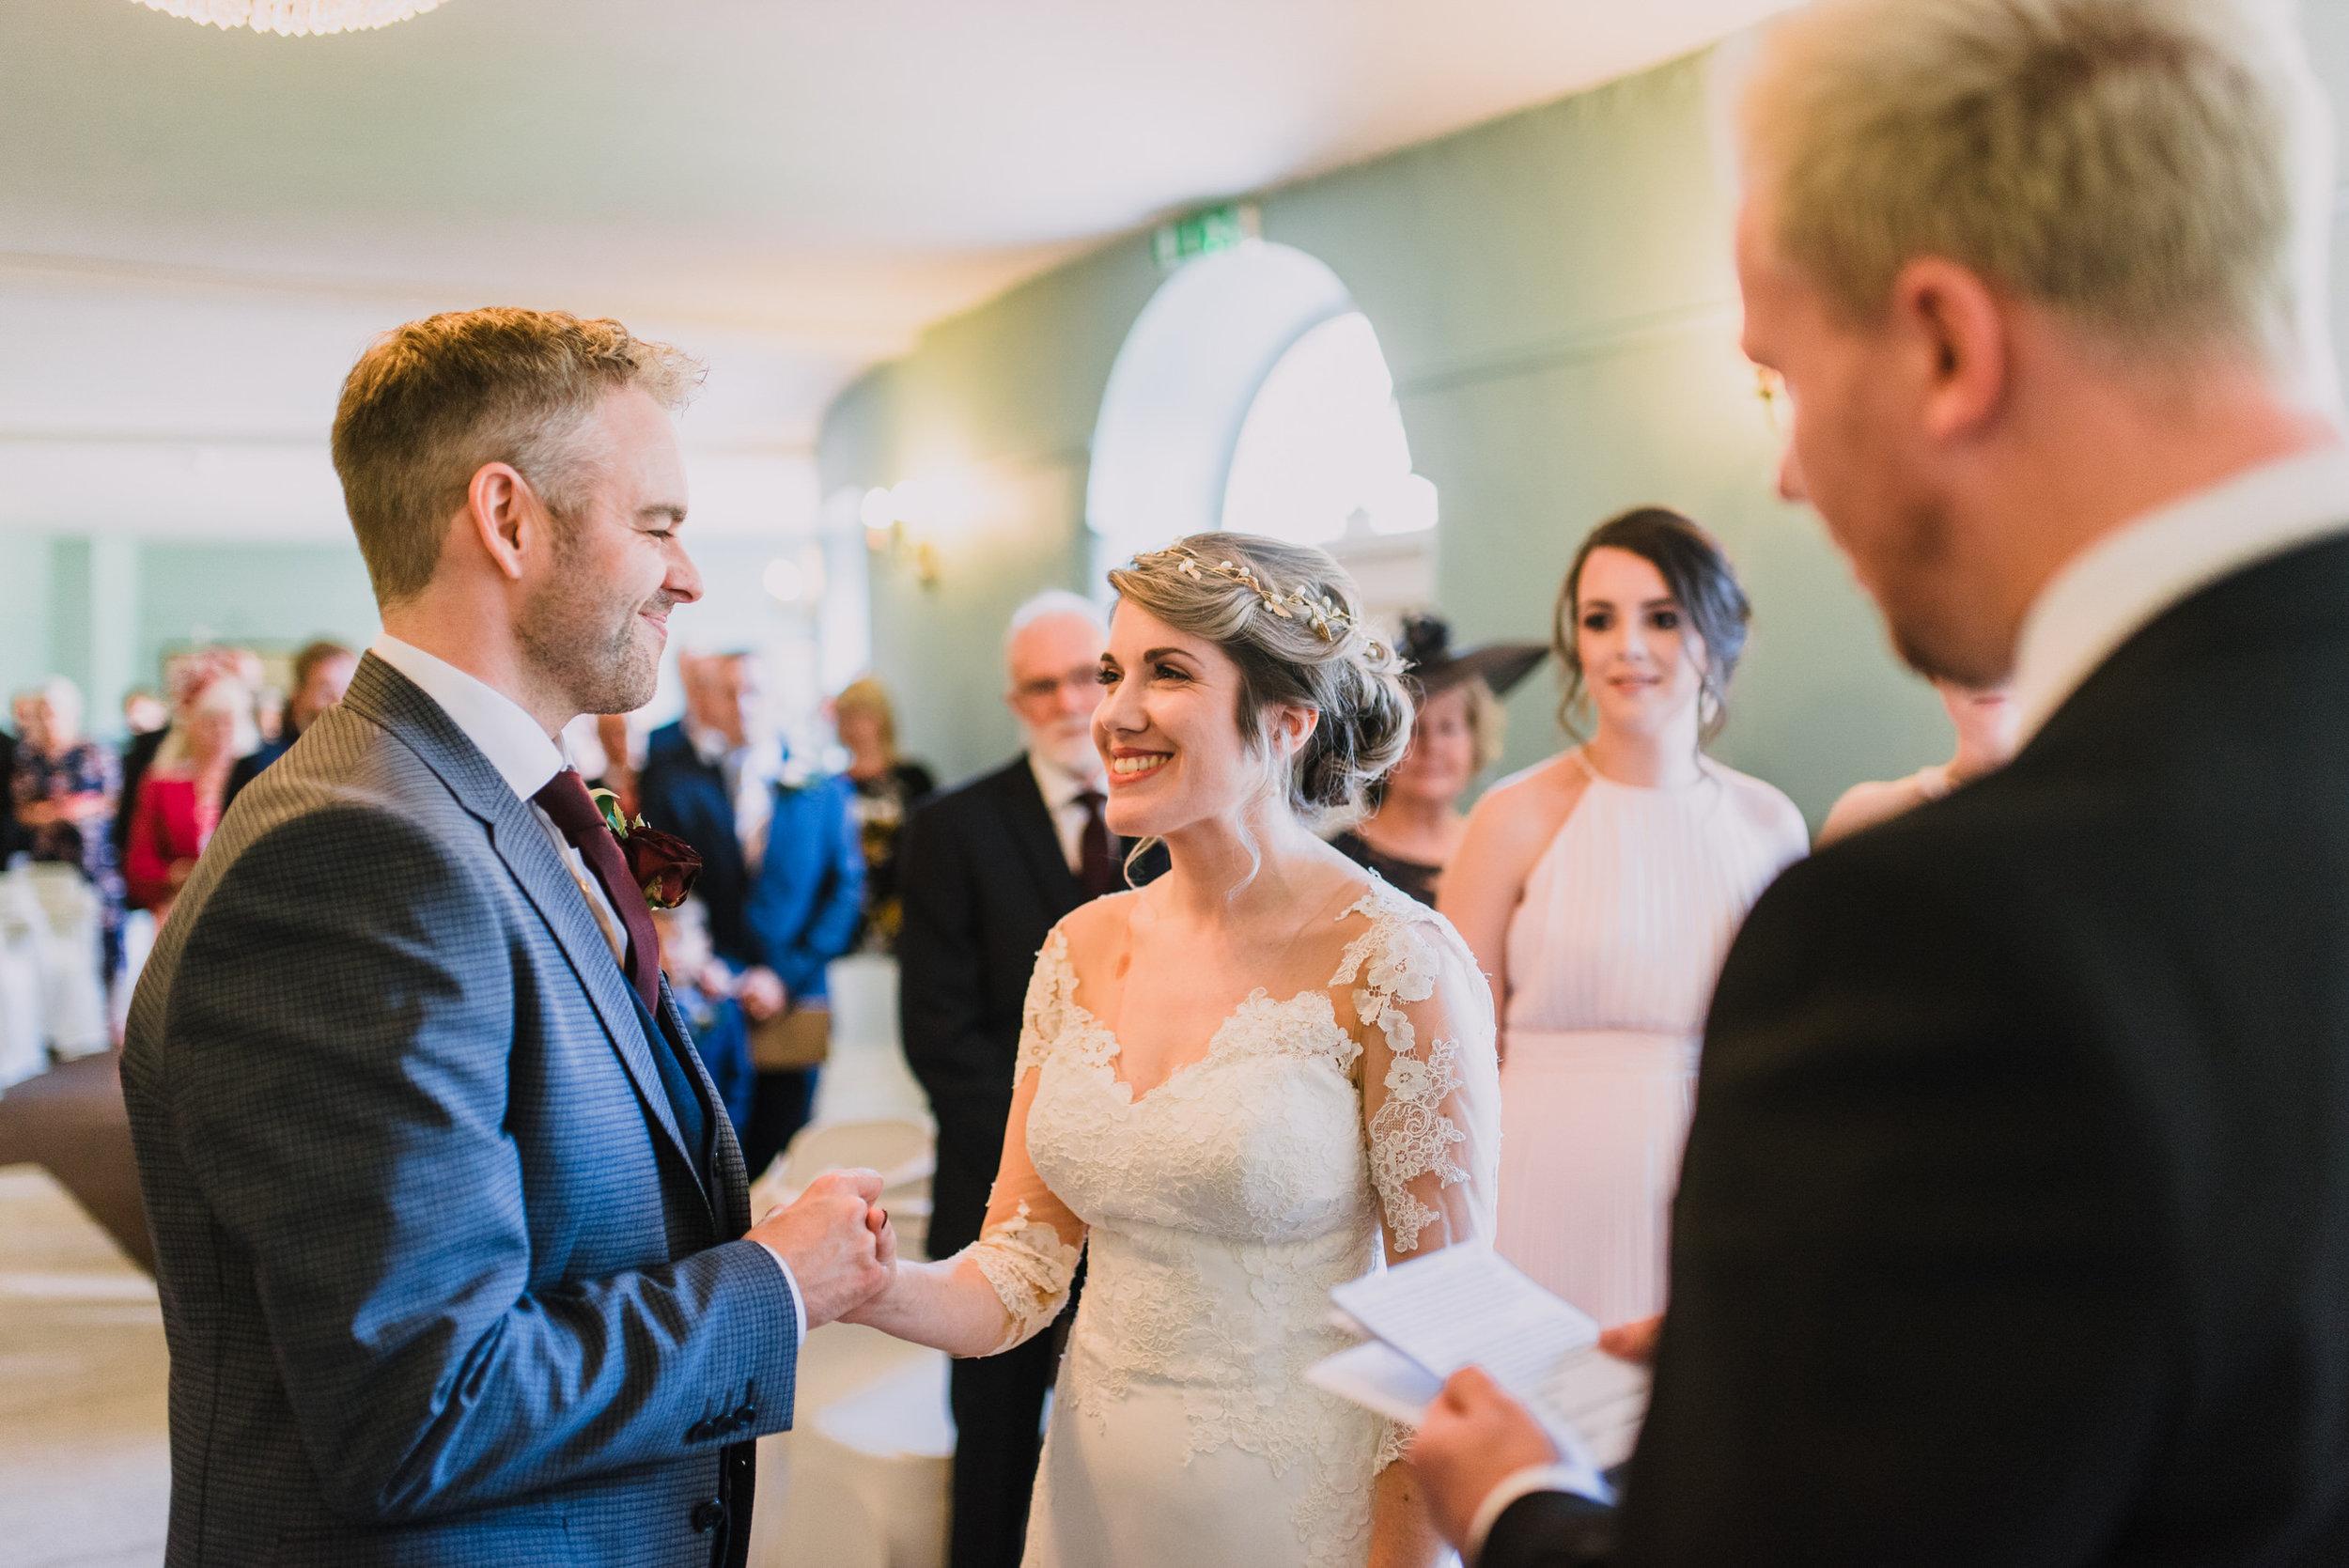 lissanoure castle wedding, northern ireland wedding photographer, romantic northern irish wedding venue, castle wedding ireland, natural wedding photography ni (54).jpg